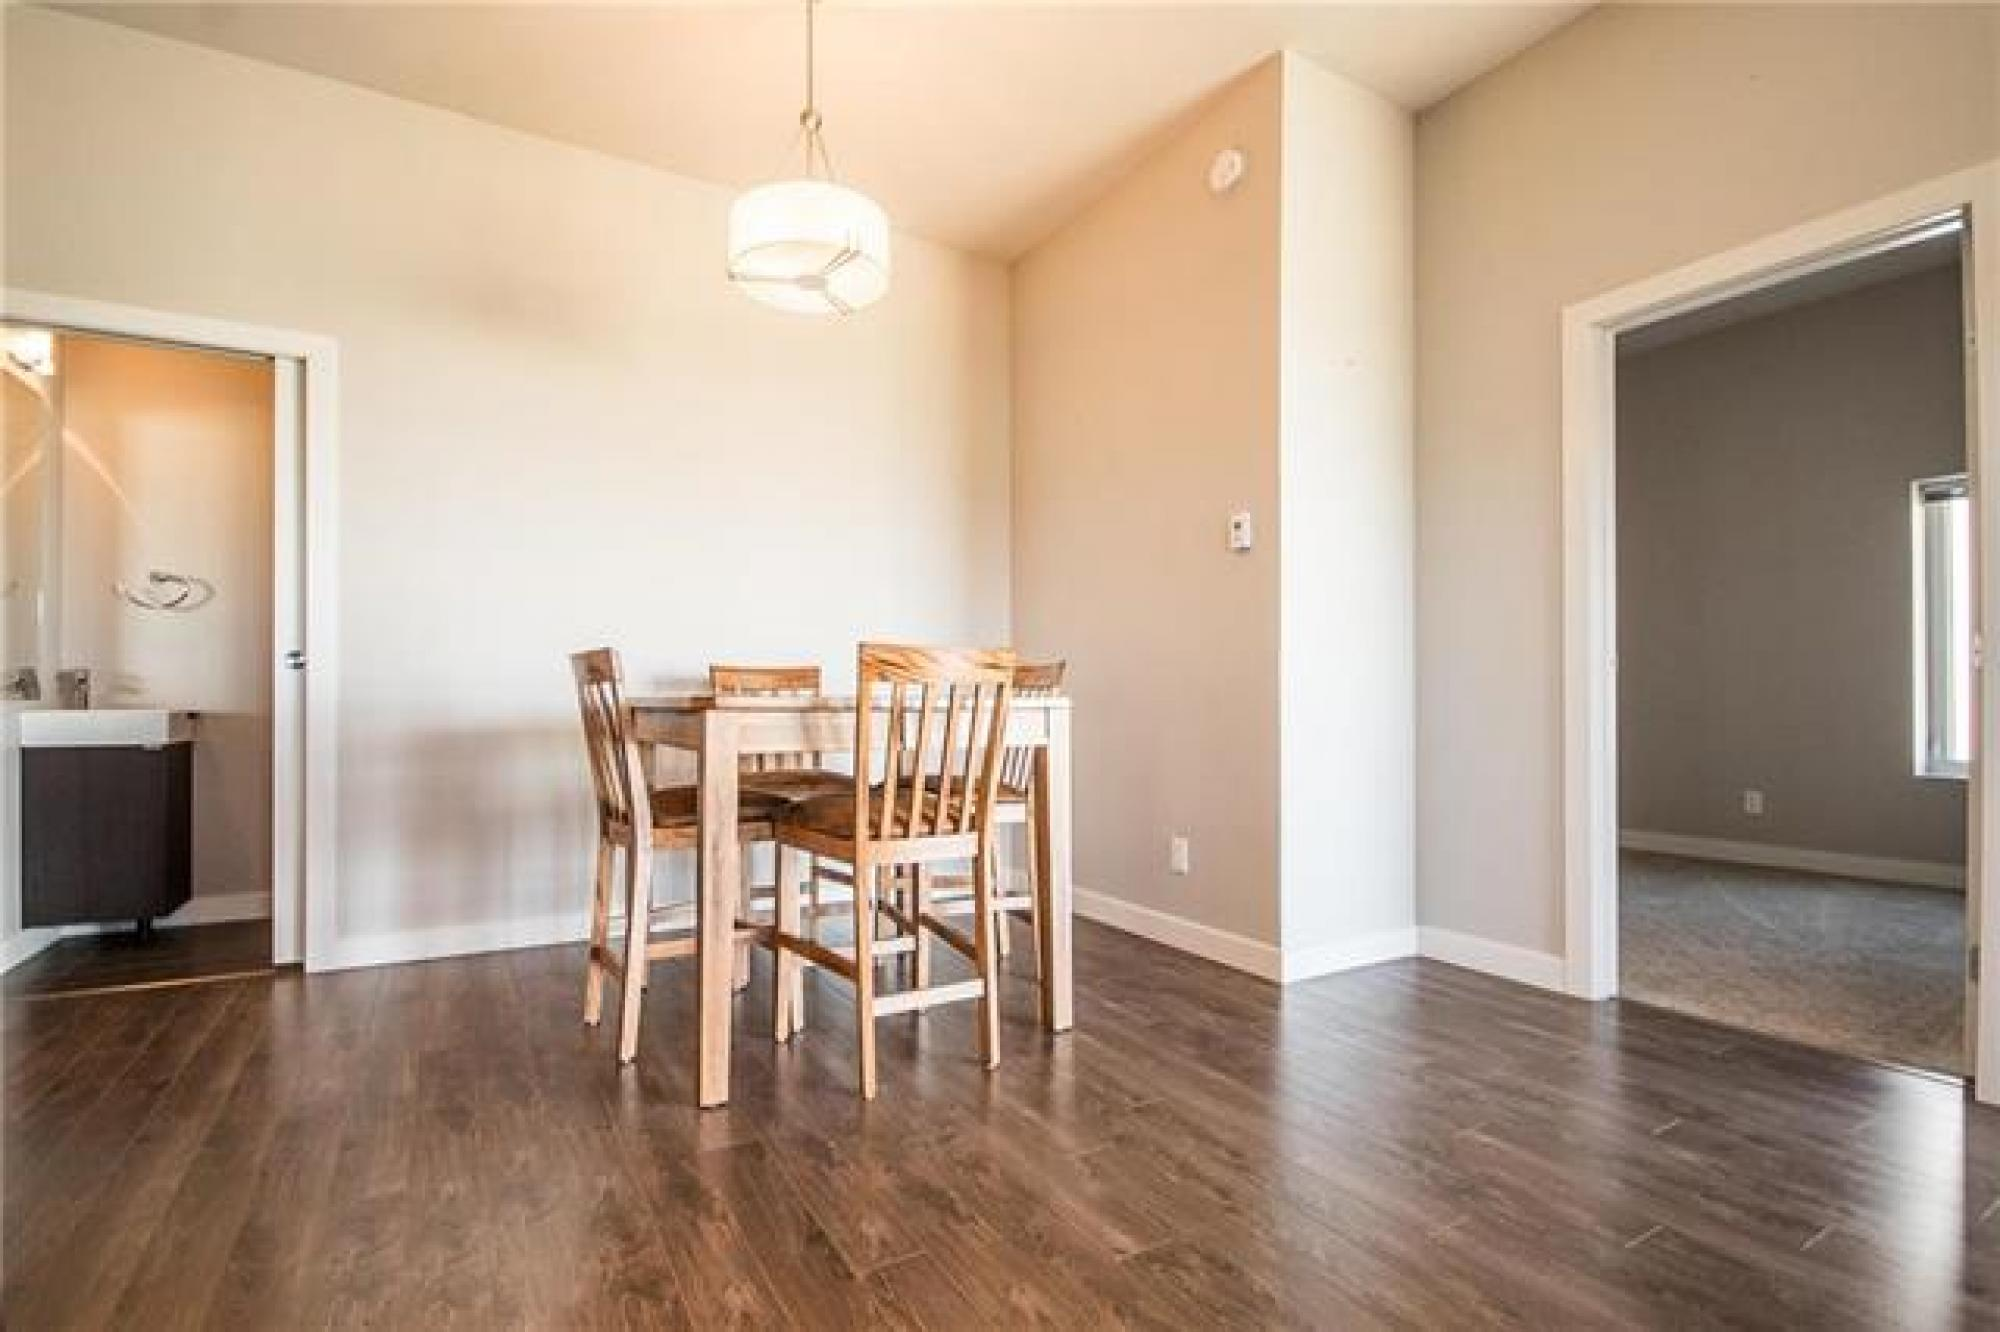 701-70 Barnes Street, R3T 3N7, 2 Bedroom for sale South ...